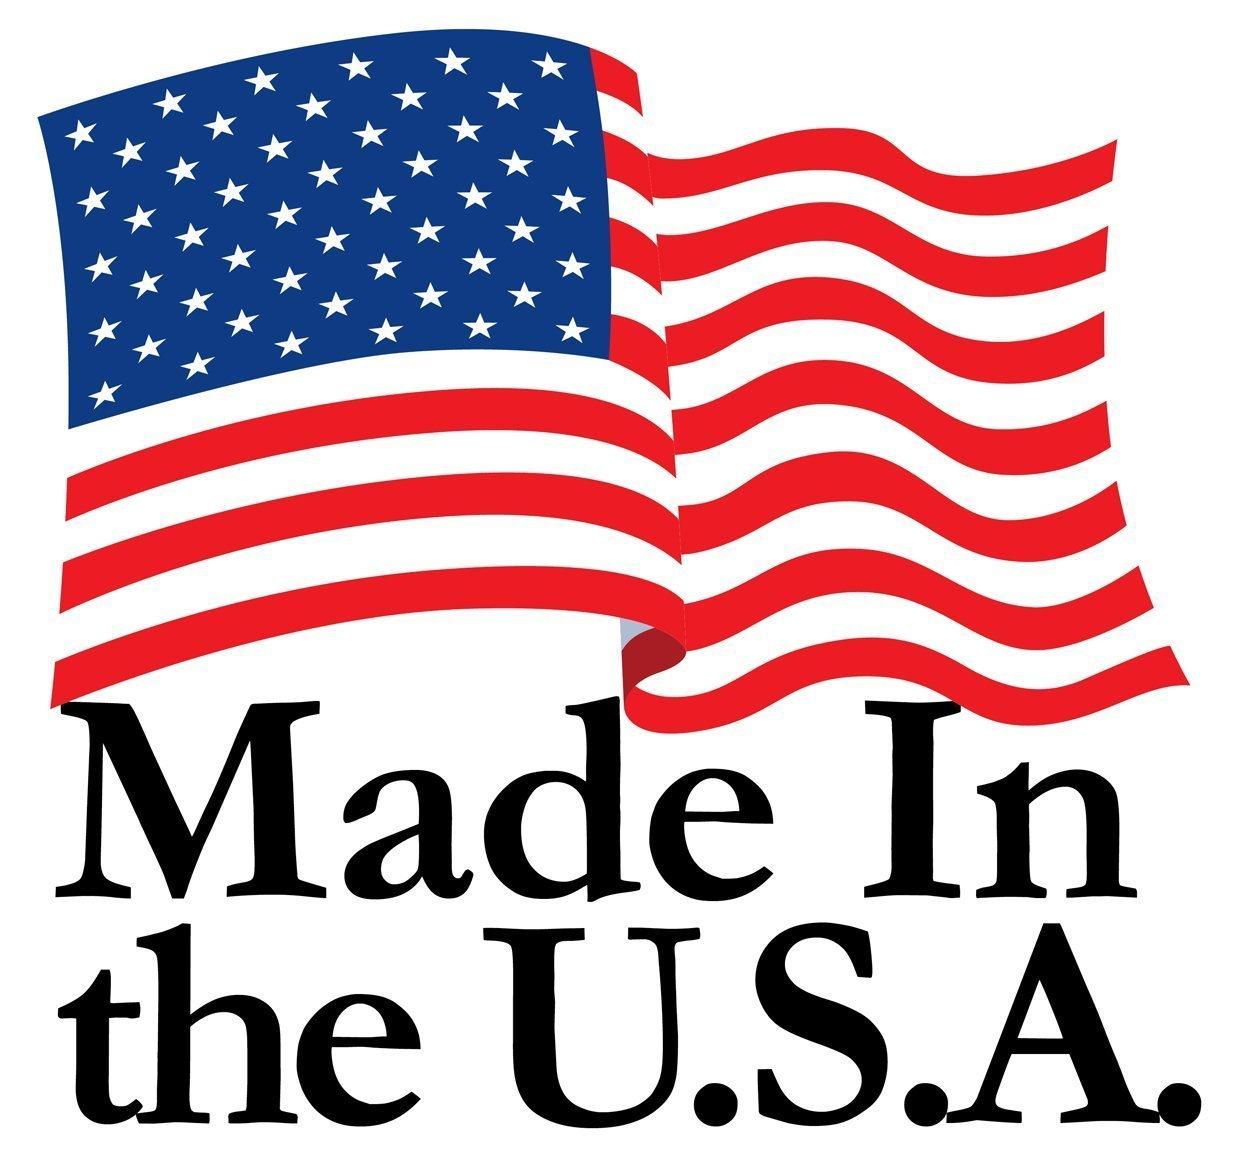 DD Sling Eye /& Eye 3,200 lbs Vertical Polyester Lifting Slings Flo Guard 2 Ply USA Made 2,600 Choker Heavy Duty 6,400 Basket Load Capacity 1 x 3 1 x 3